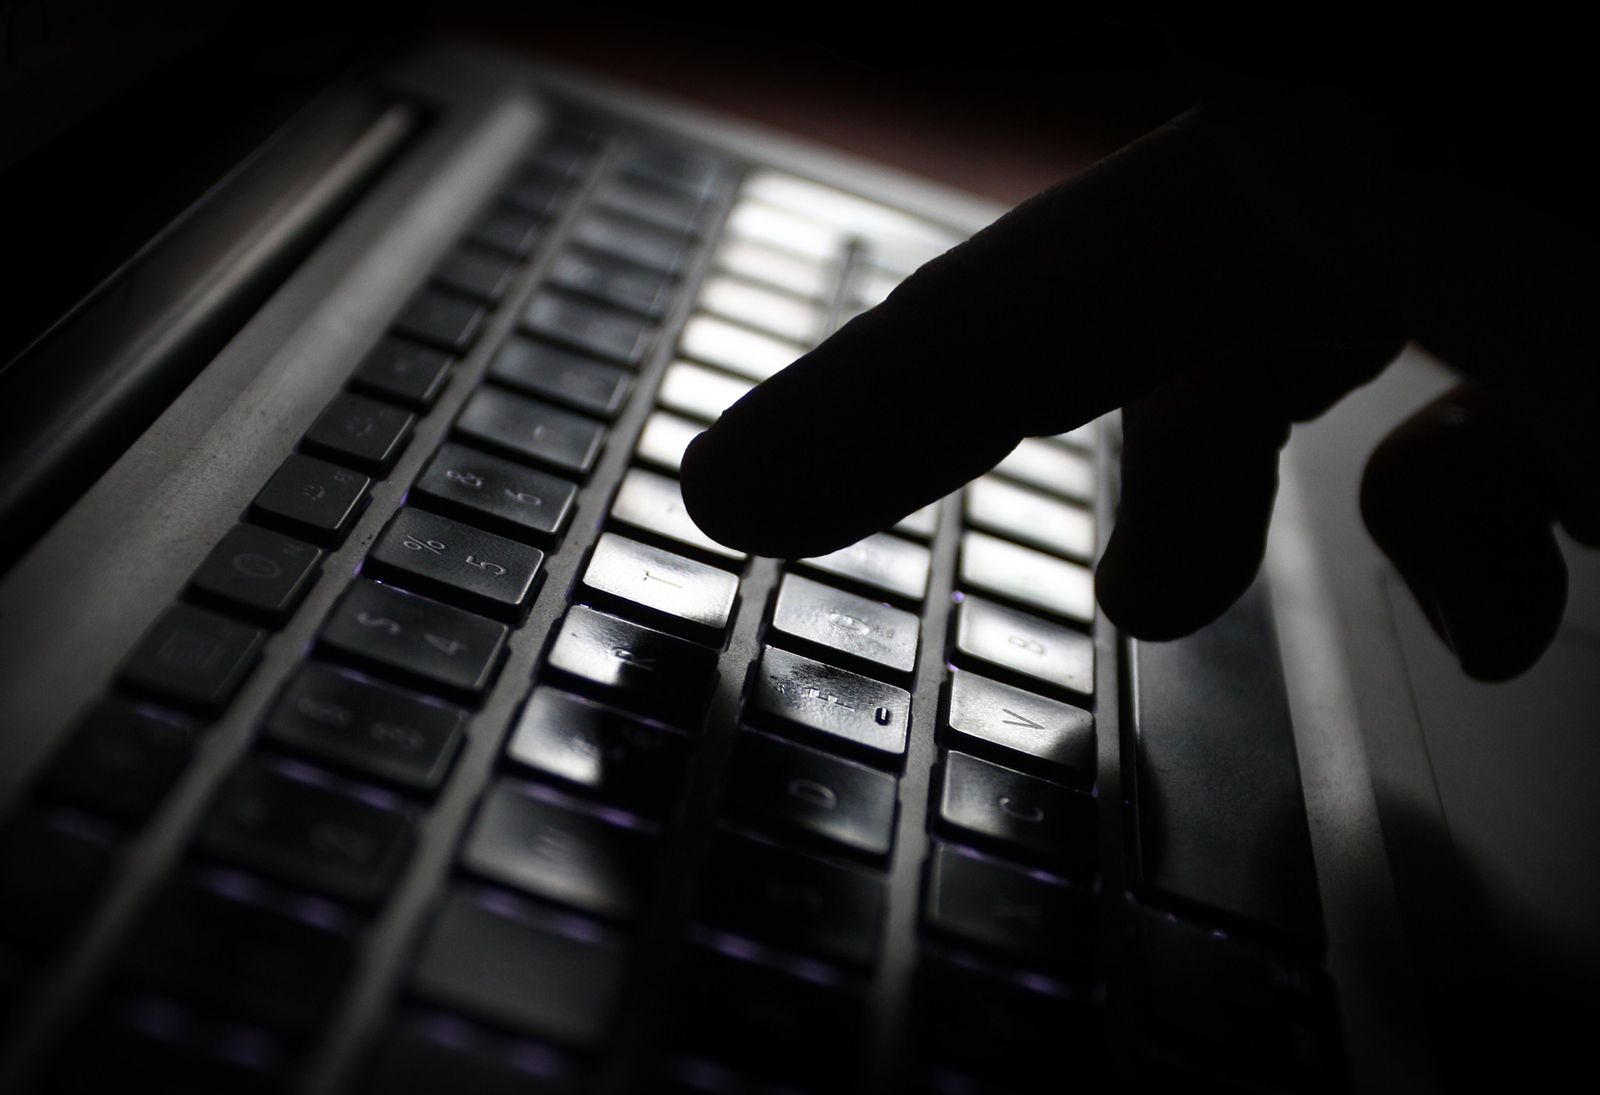 Firmen unterschätzen kriminelle Hacker